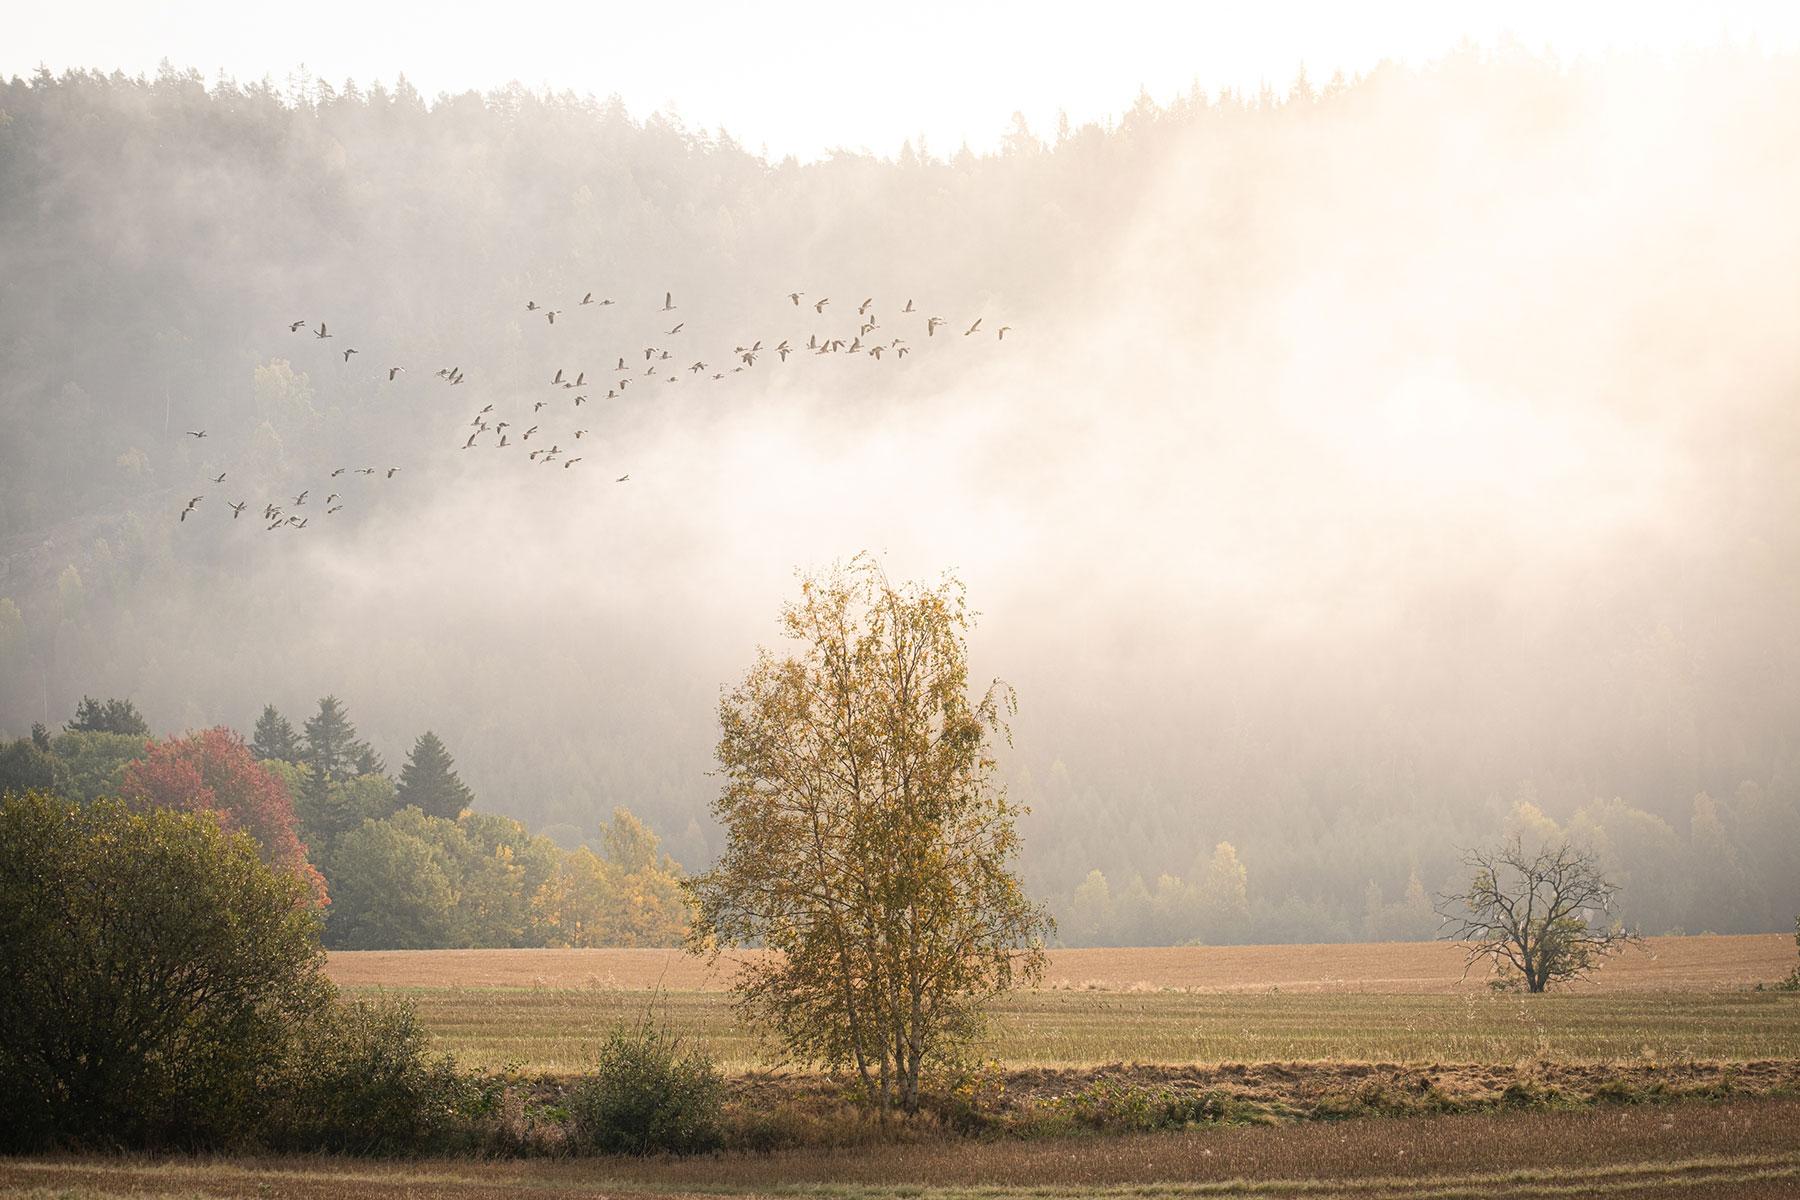 Calm, natural Norwegian landscape